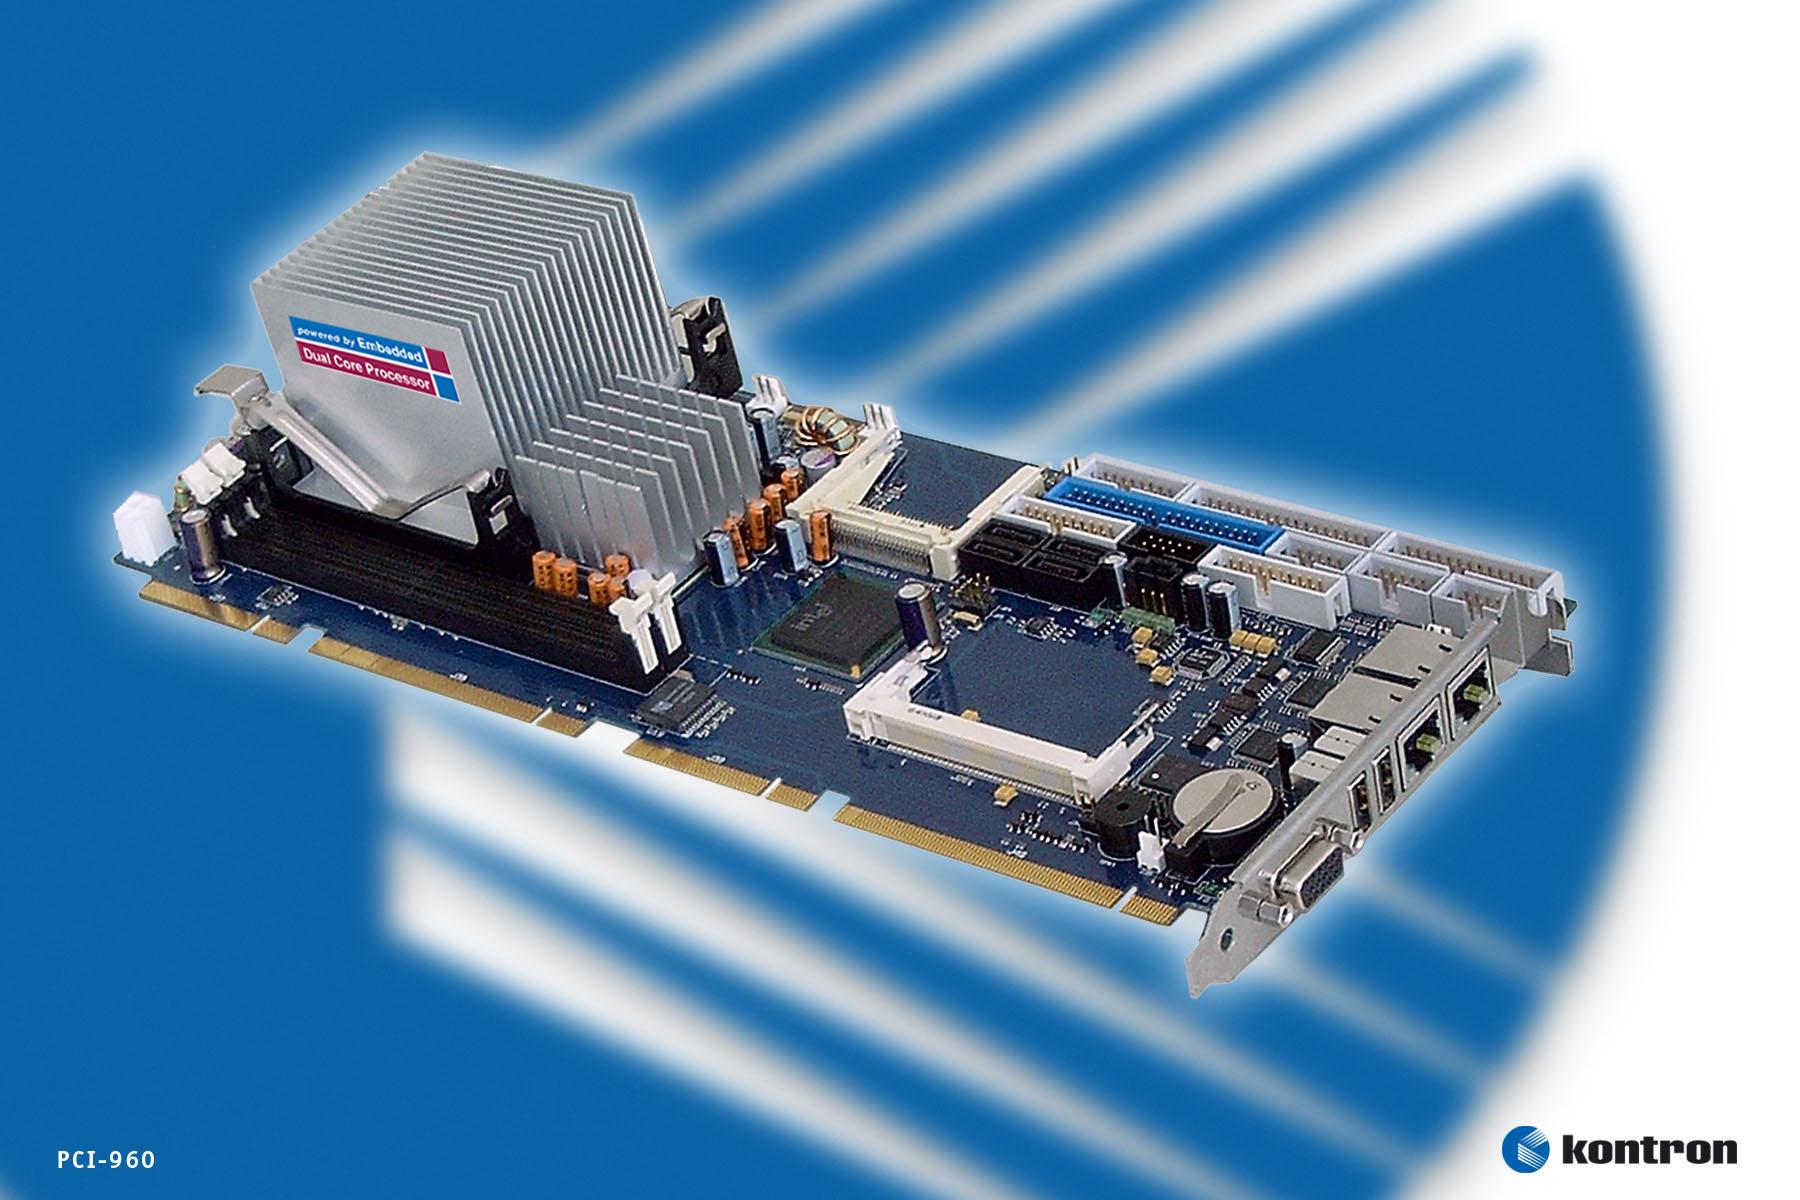 слот-компьютер PCI-960, в стандарте PICMG 1.3